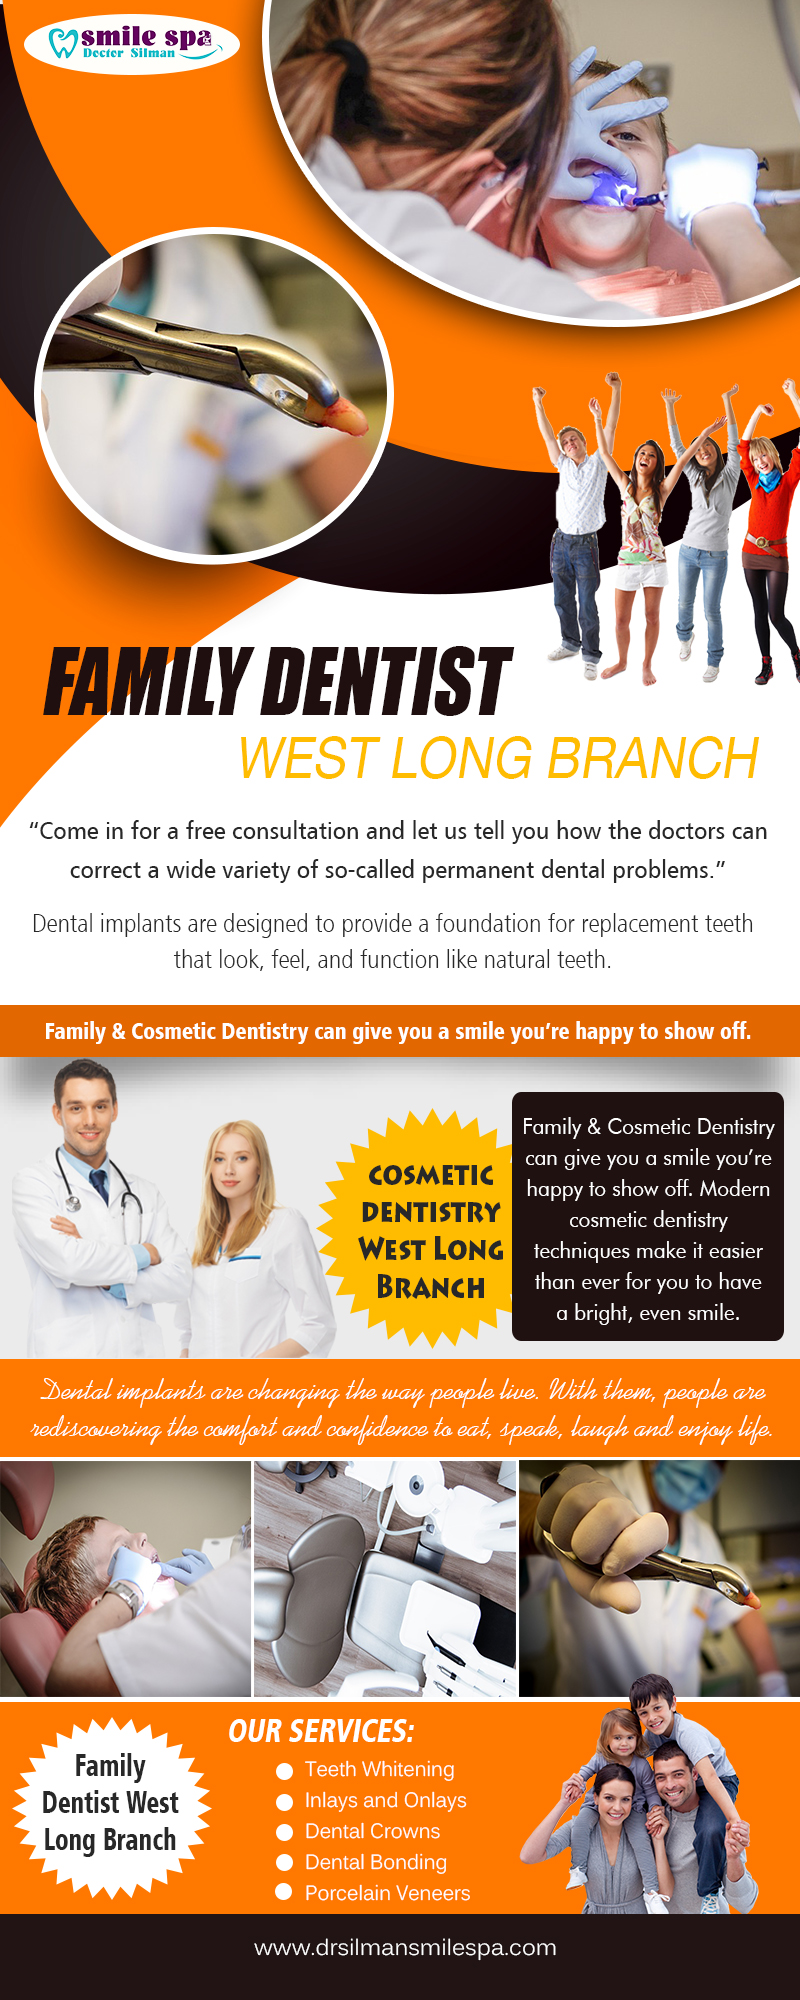 Best Dentist West Long Branch | Call – 732 222 0029 | www.drsilmansmilespa.com